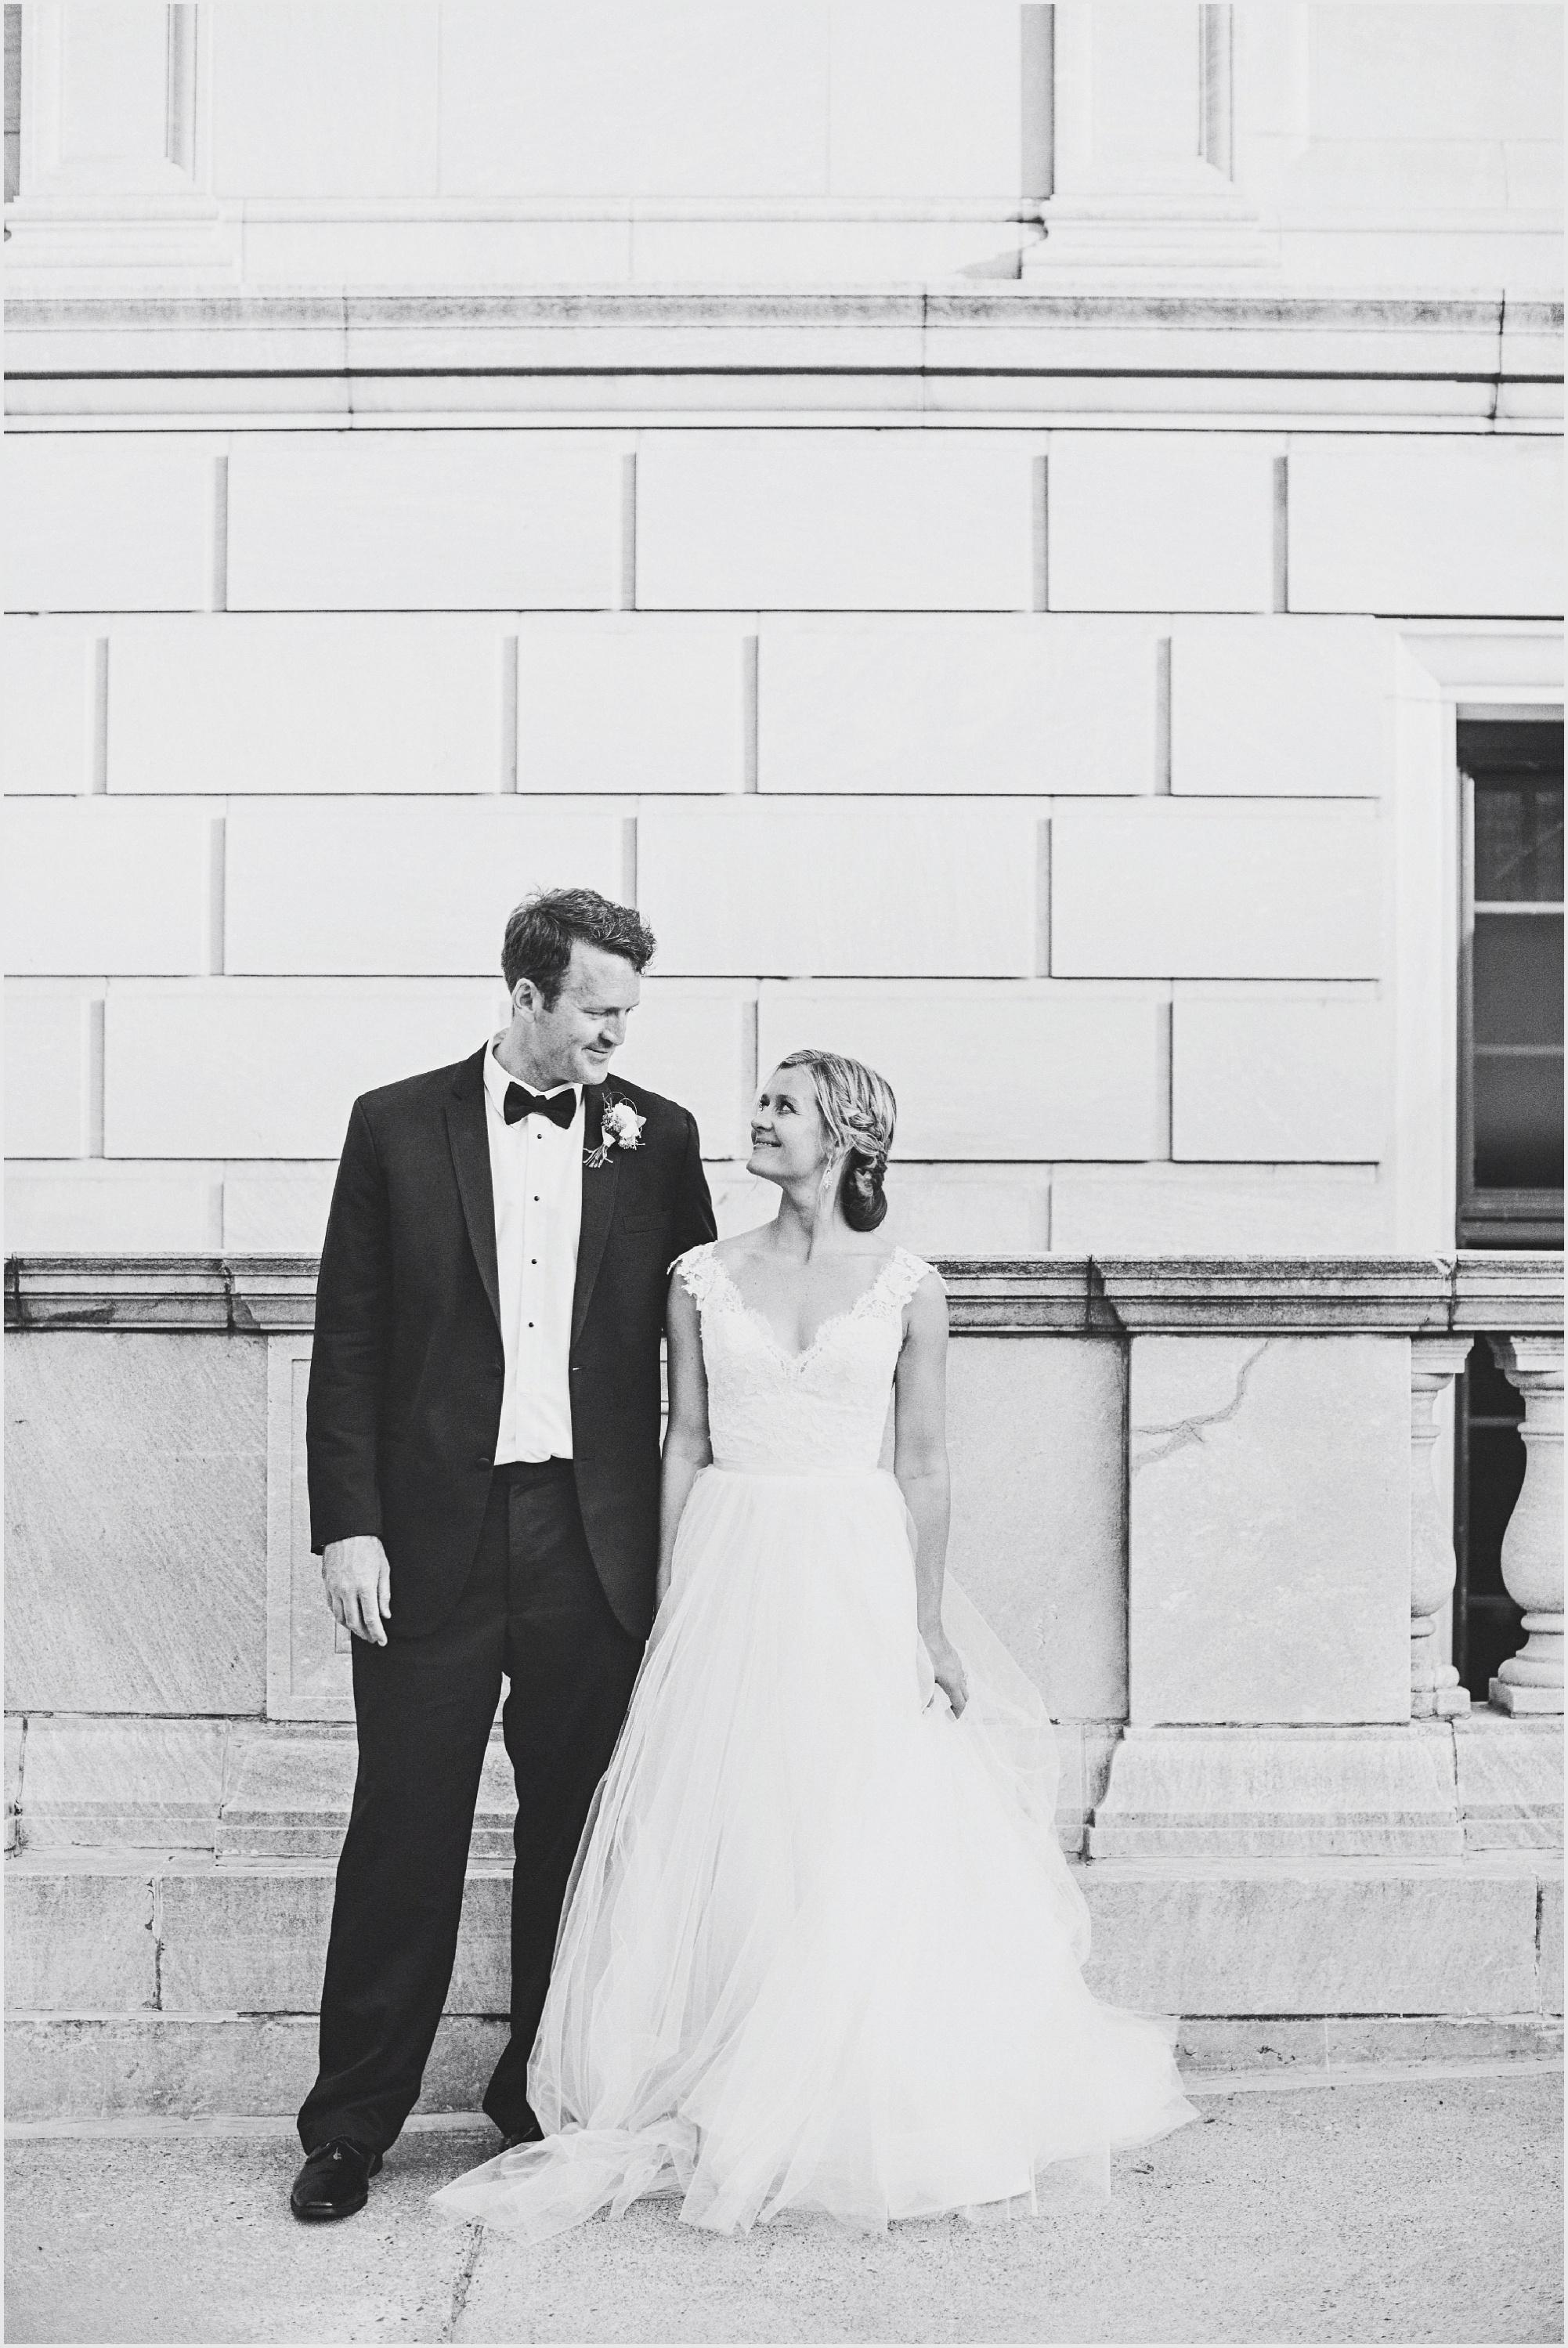 maura_david_james_j_hill_wedding_lucas_botz_photography_052.jpg